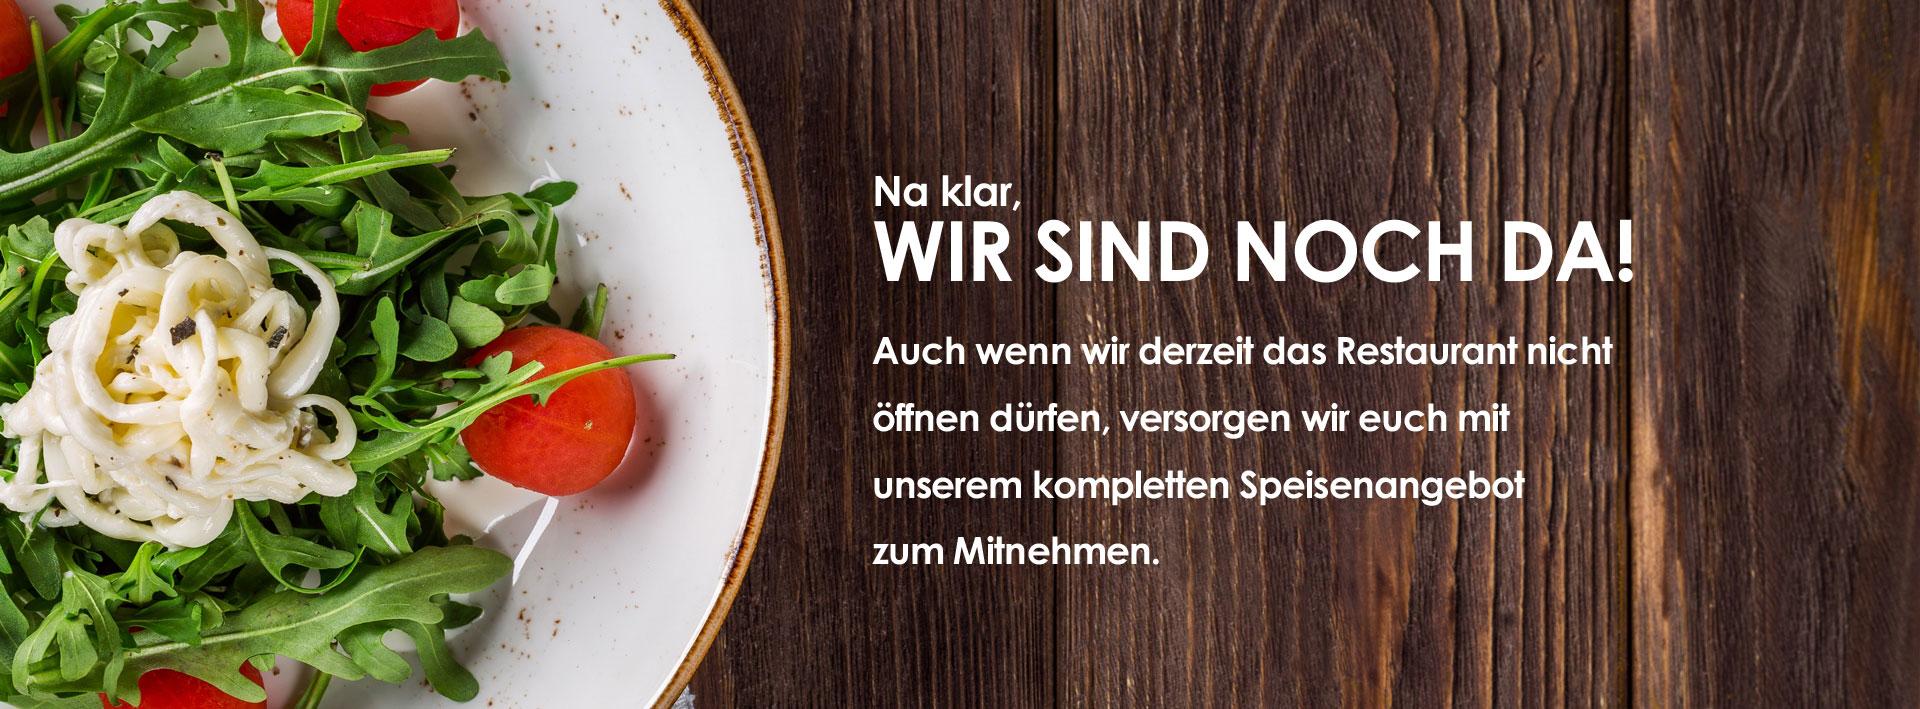 https://sowiso-rodgau.de/index.php/specials